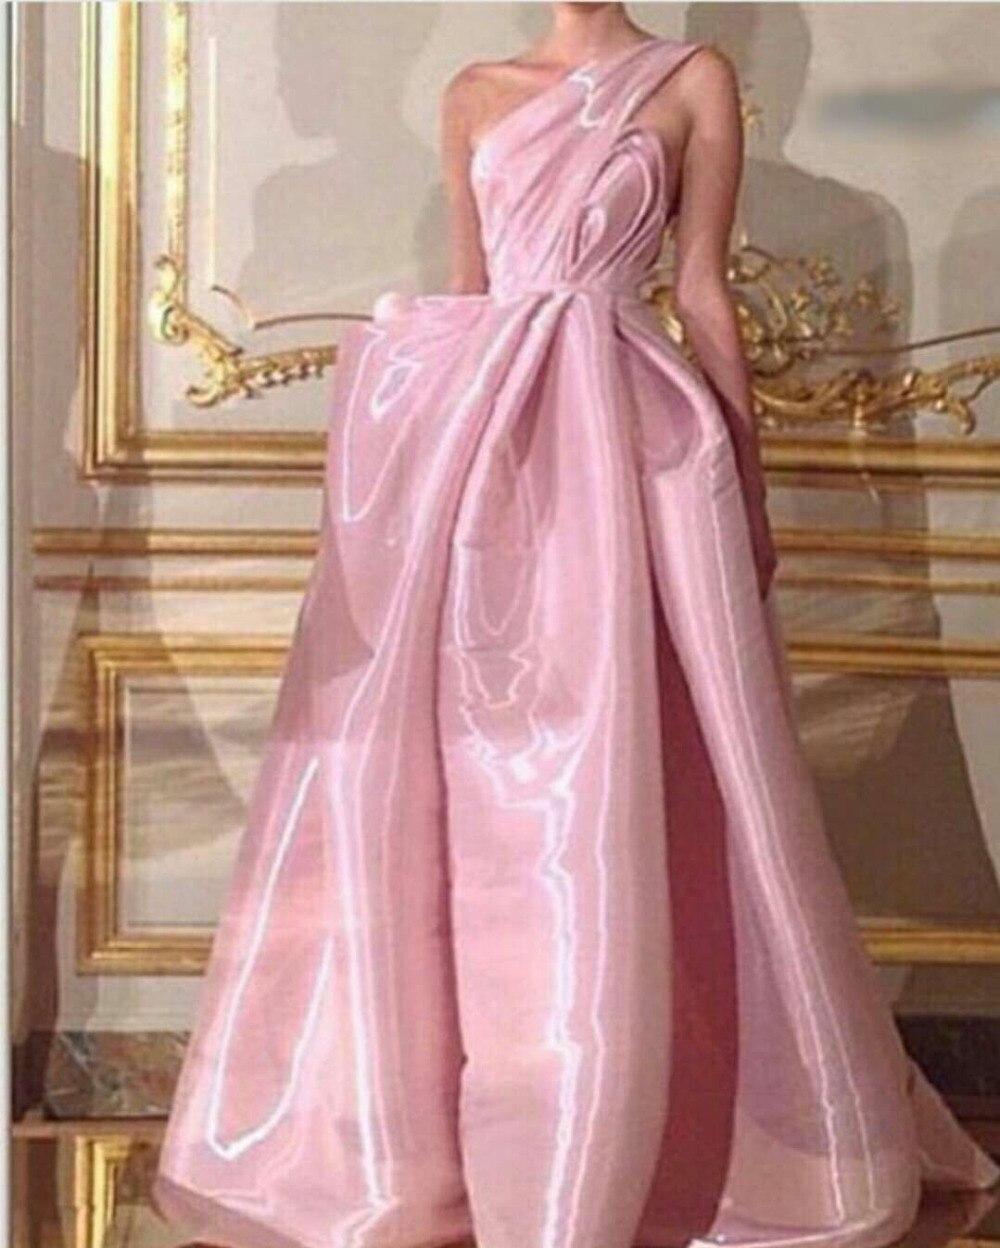 Prom Evening Gown 2018 A-Line One Shoulder Ruched Long Satin Vestido De Noiva Off The Shoulder Mother Of The Bride Dresses